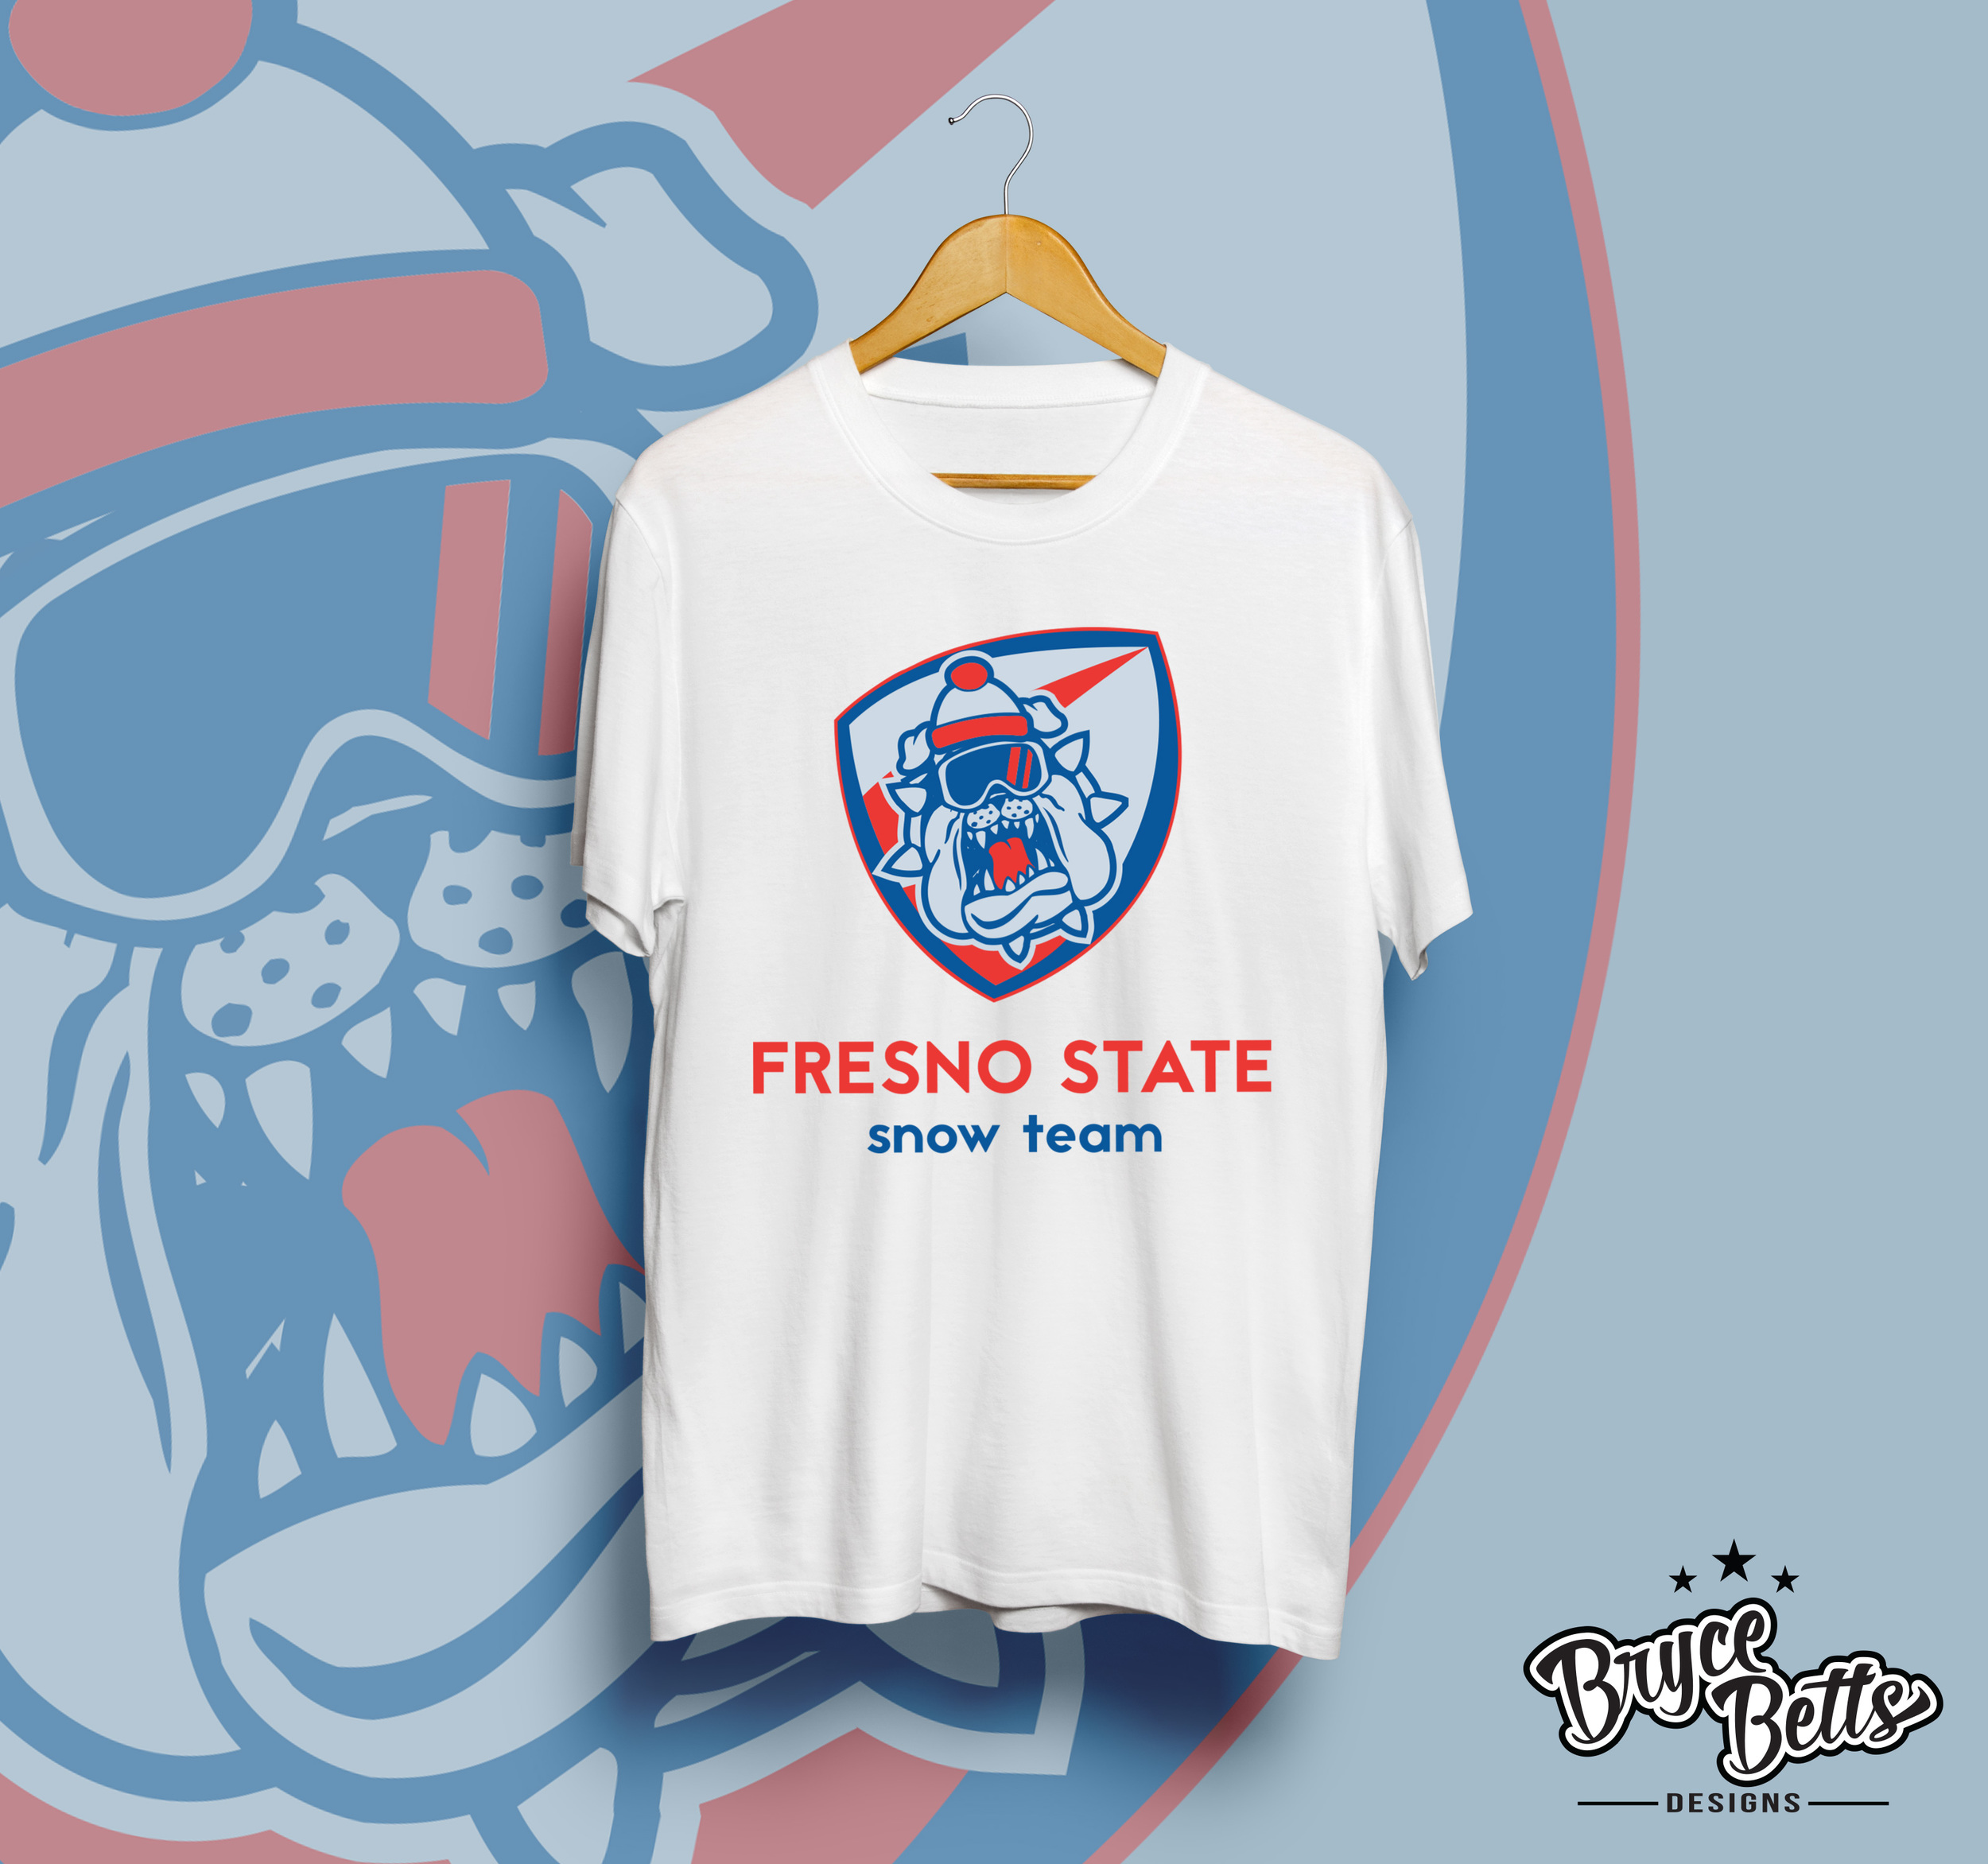 Fresno State Snowboarding shirt design